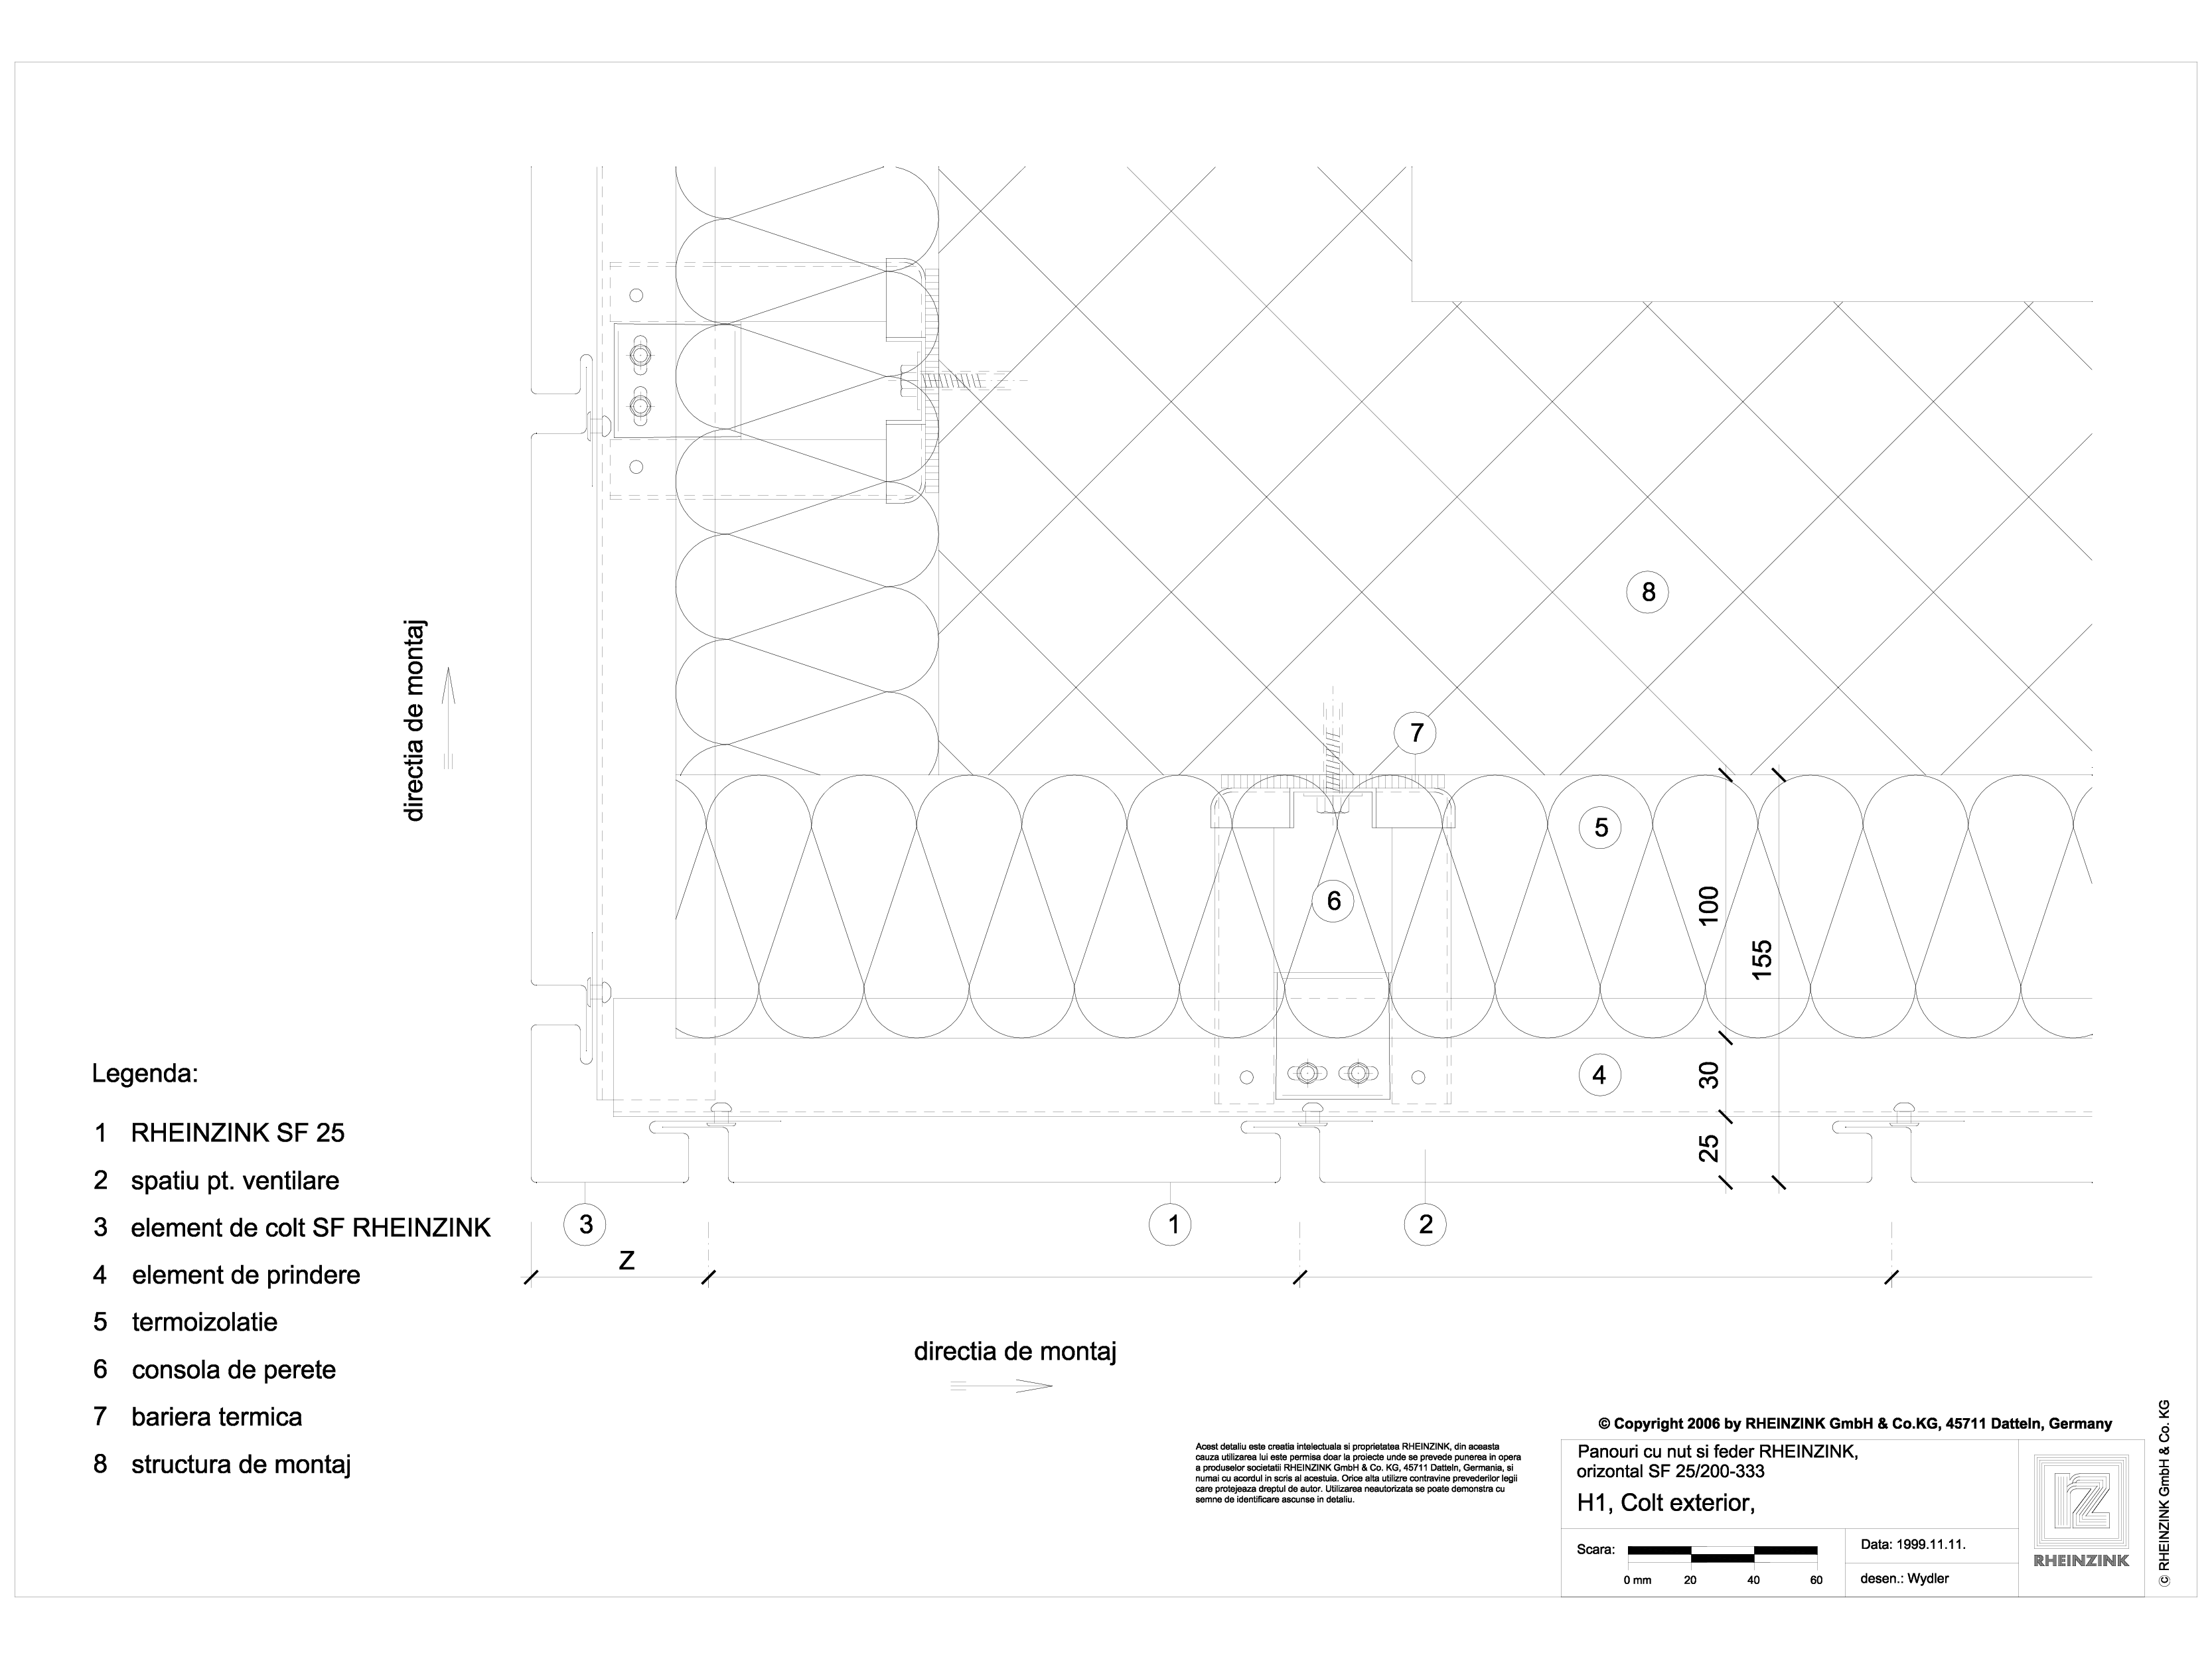 Pagina 1 - CAD-DWG Panou cu nut si feder - H1 Colt exterior cu element de colt in planul peretelui...